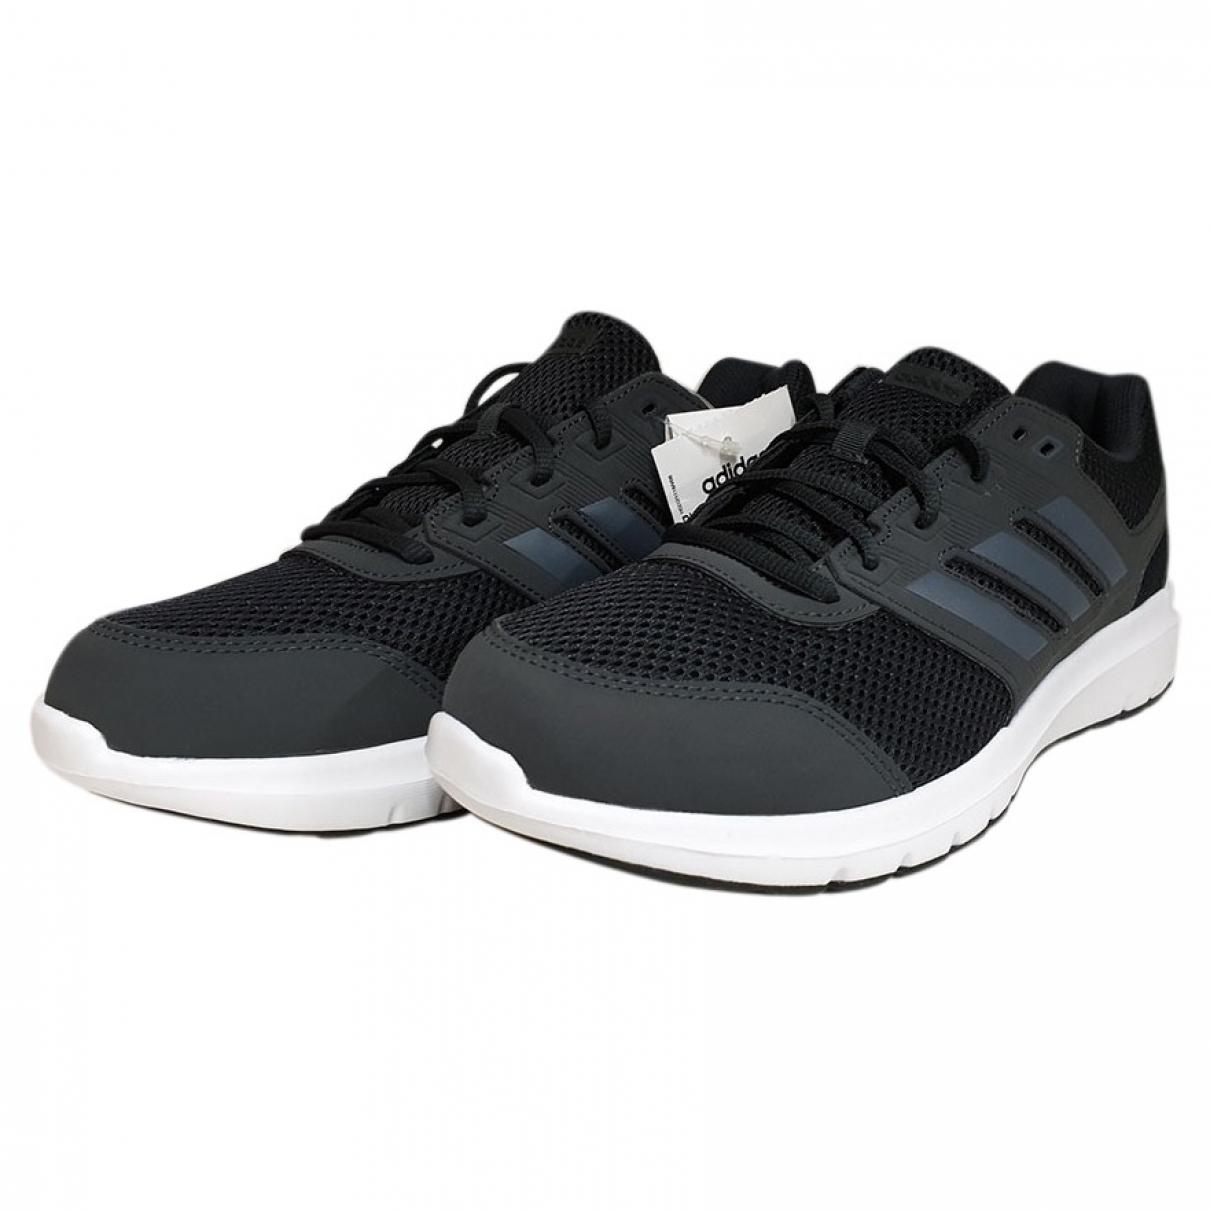 Adidas \N Sneakers in  Anthrazit Leinen